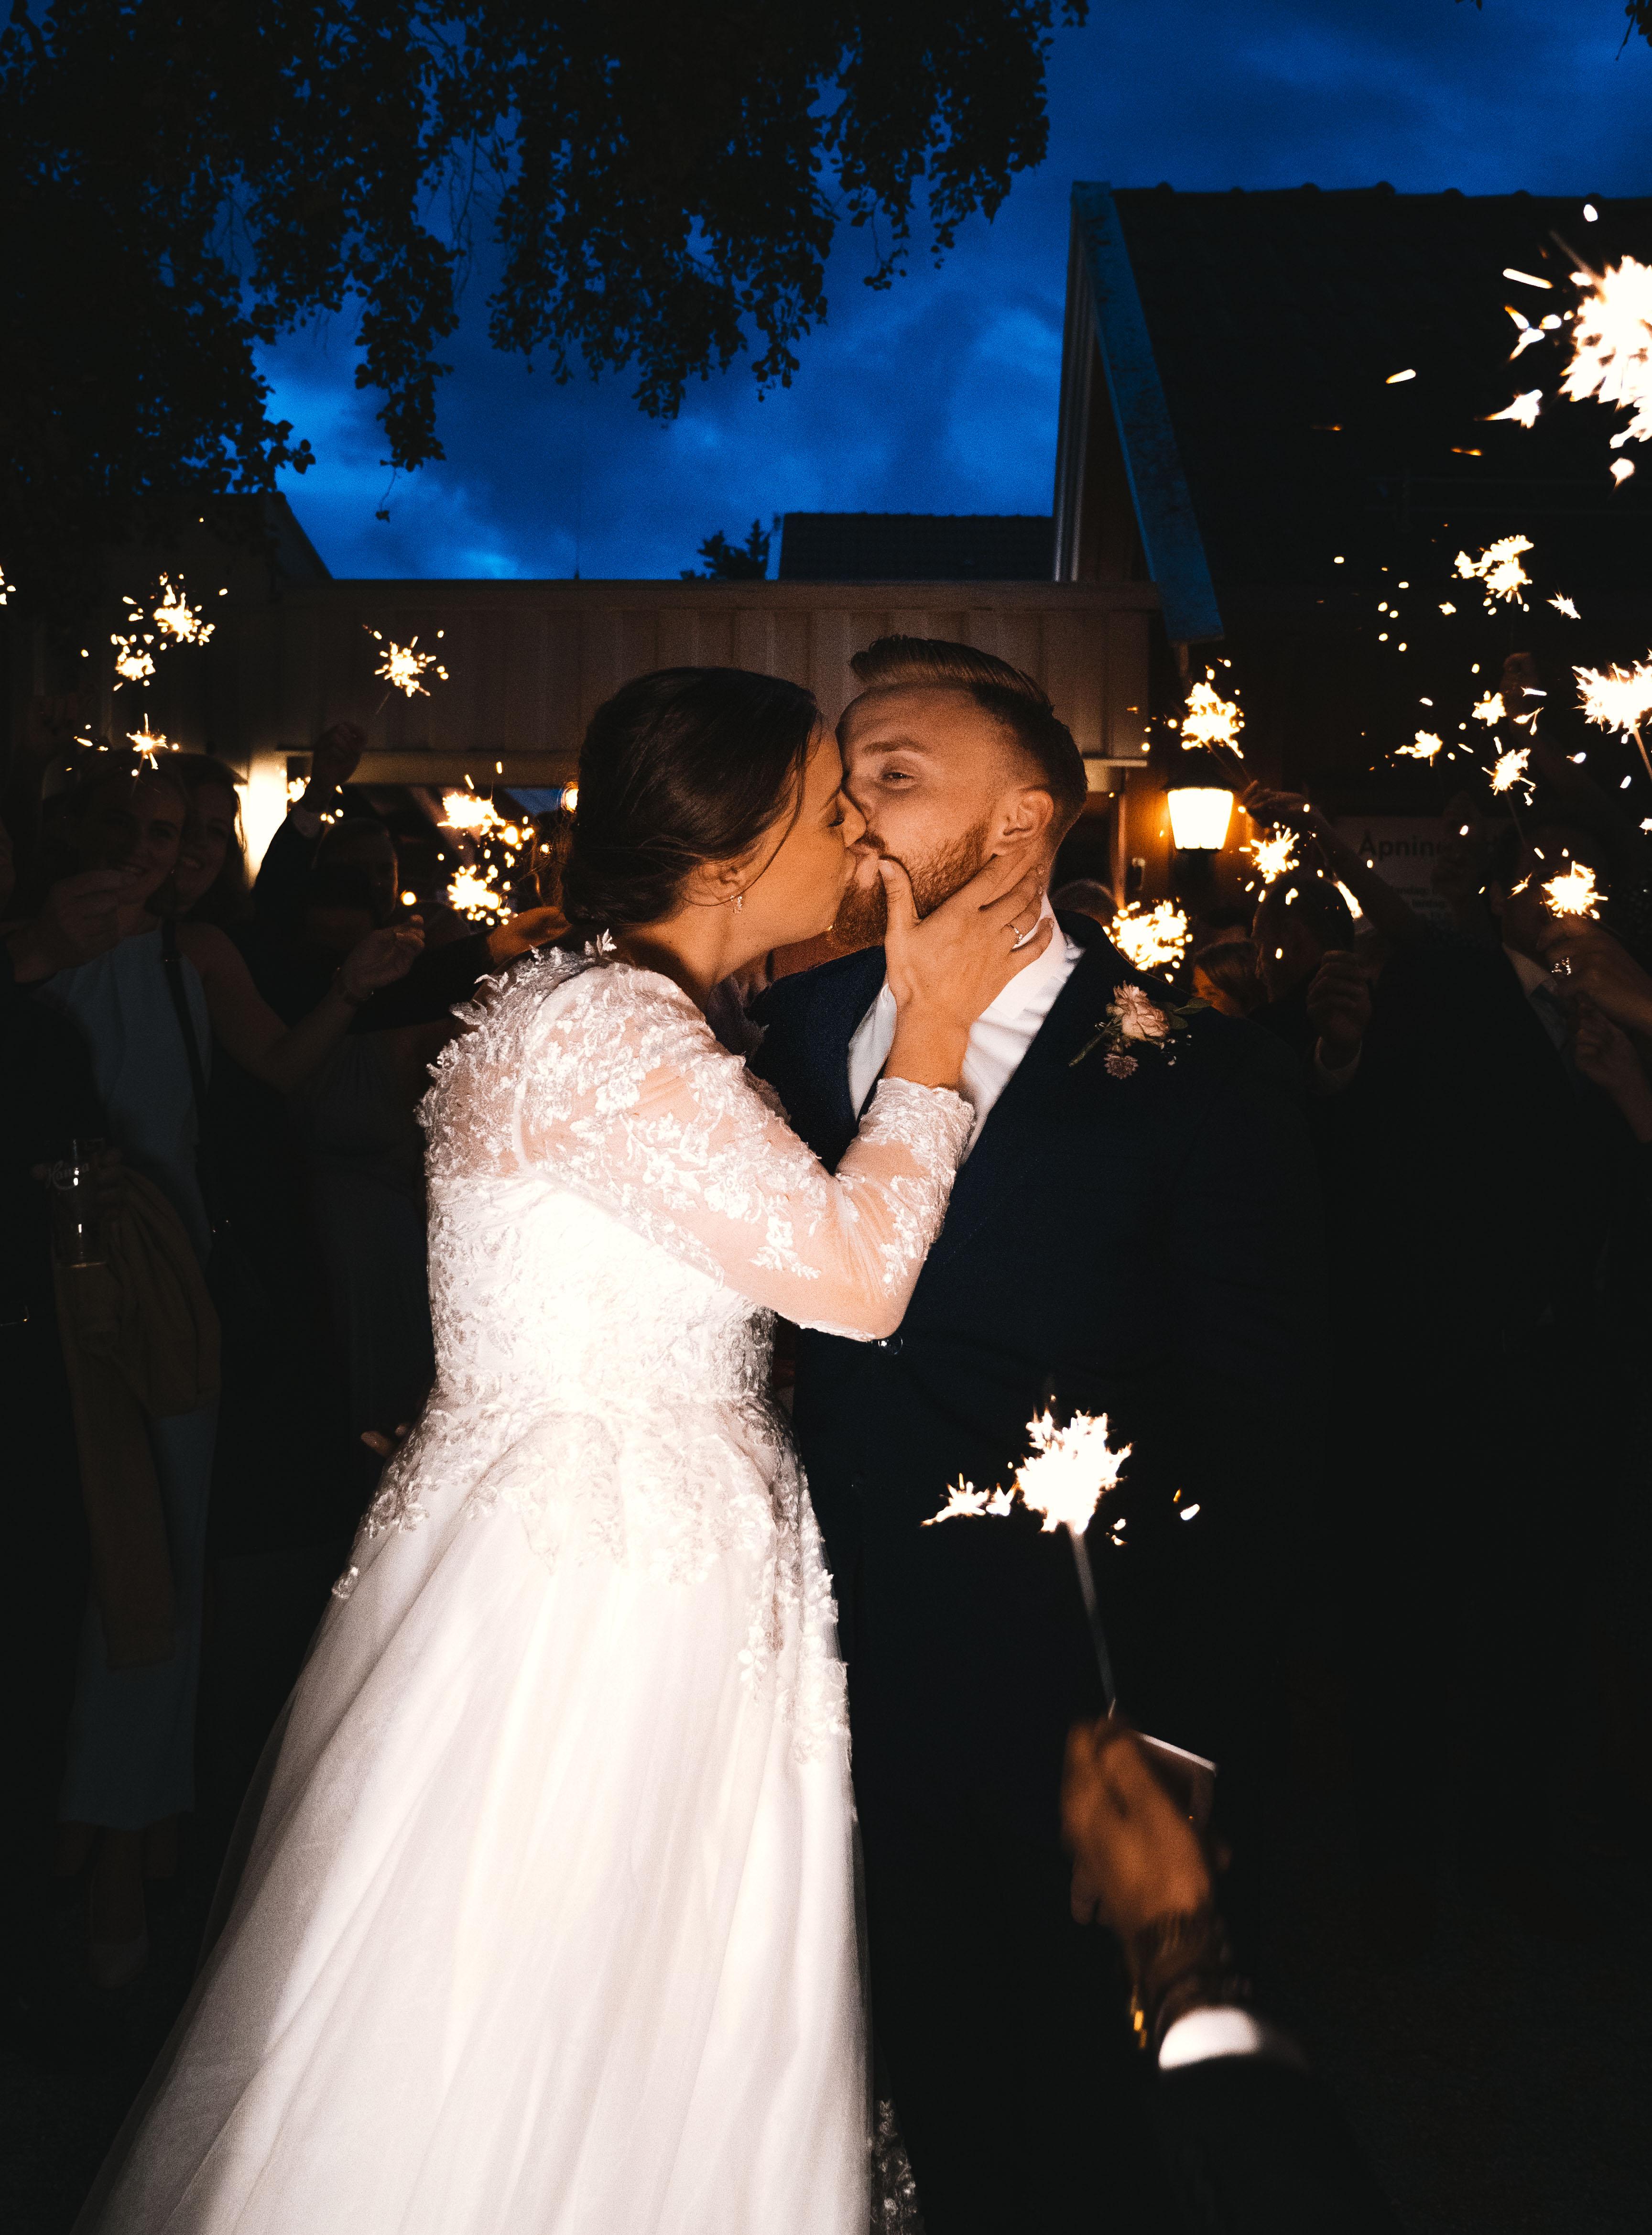 Tonje og Aleksander 2019 - Night kiss